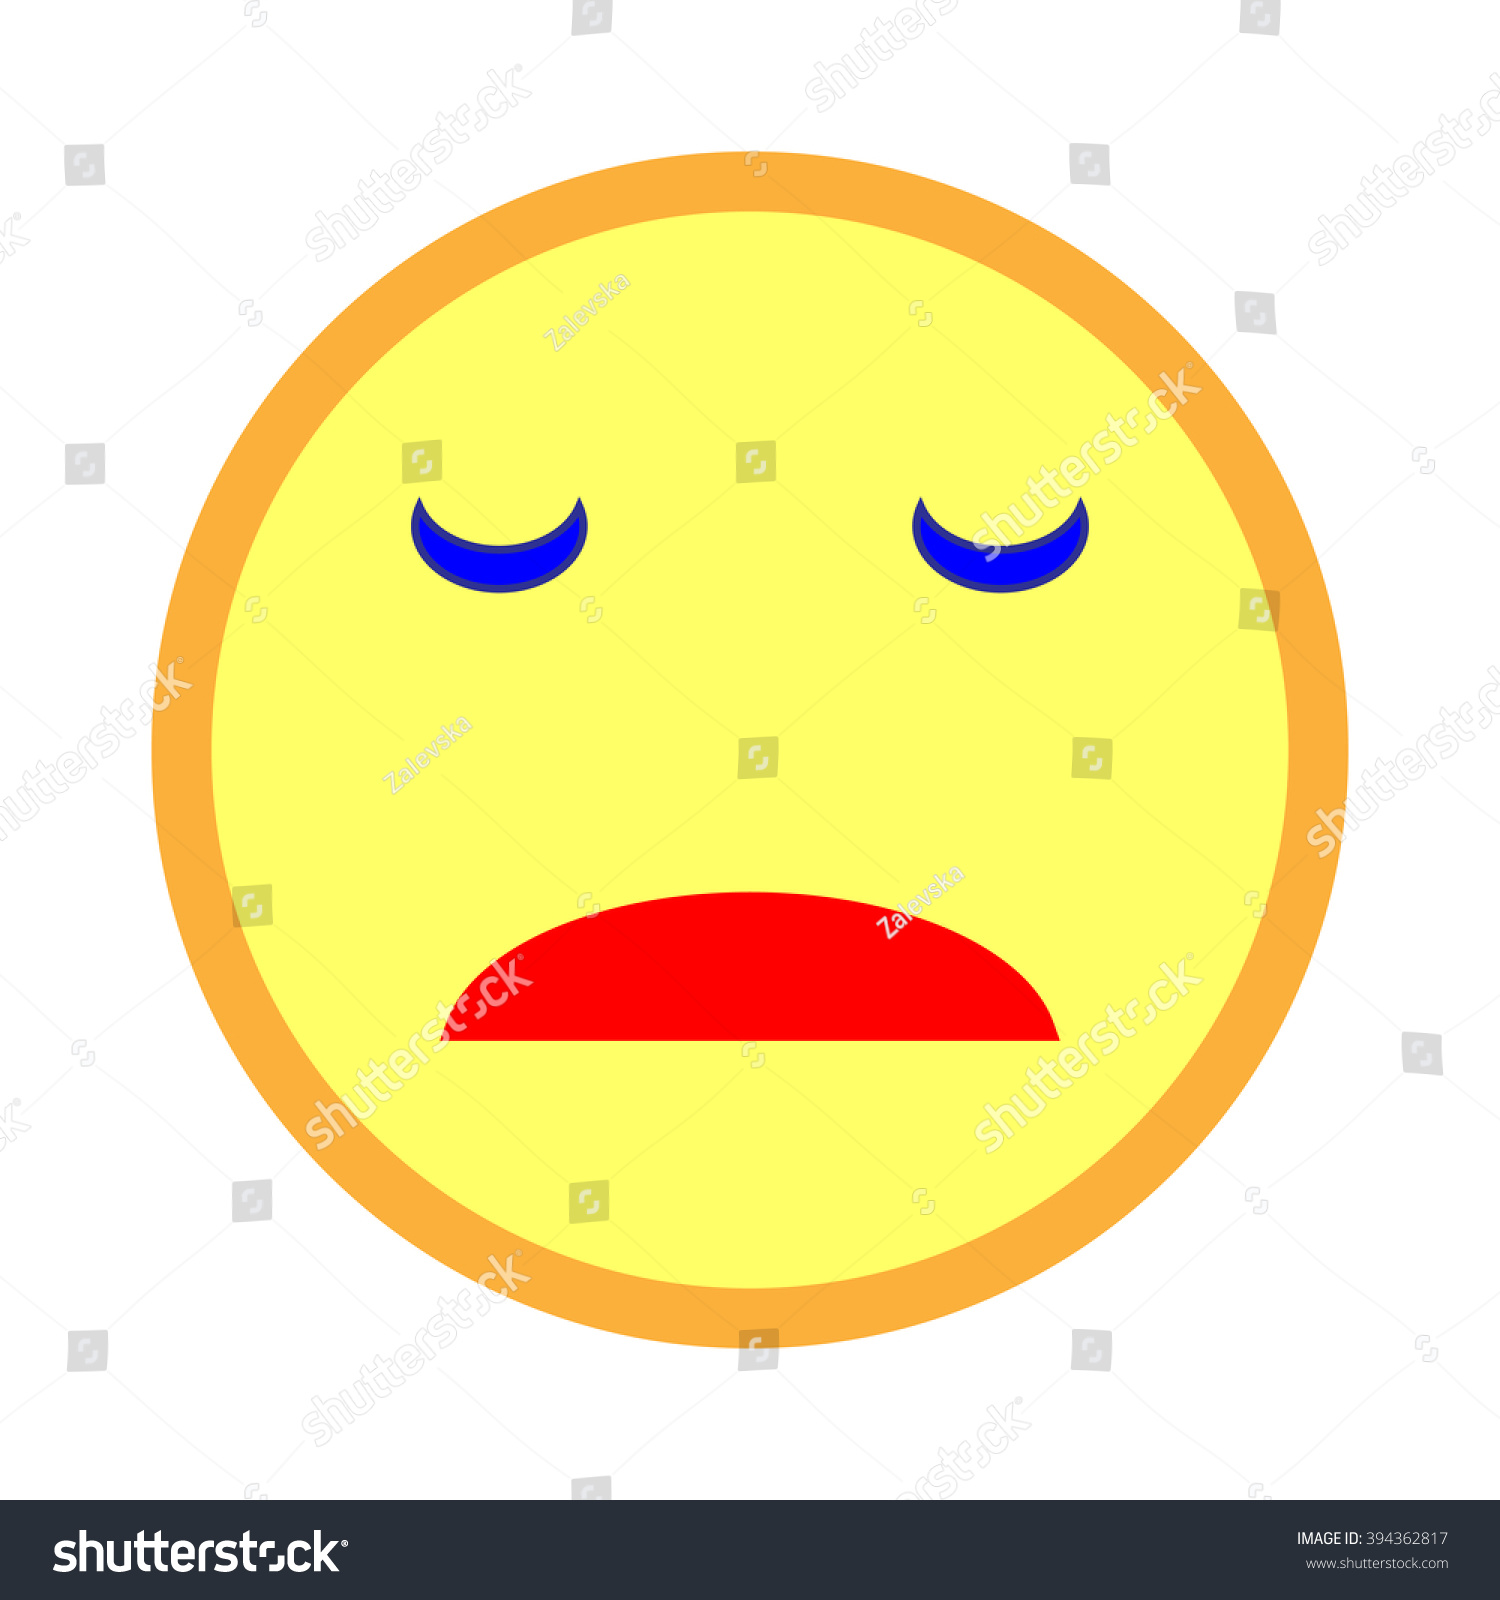 Sad smiley emoticon on white background stock vector 394362817 sad smiley emoticon on white background vector illustration of yellow sad smile smile icon buycottarizona Choice Image